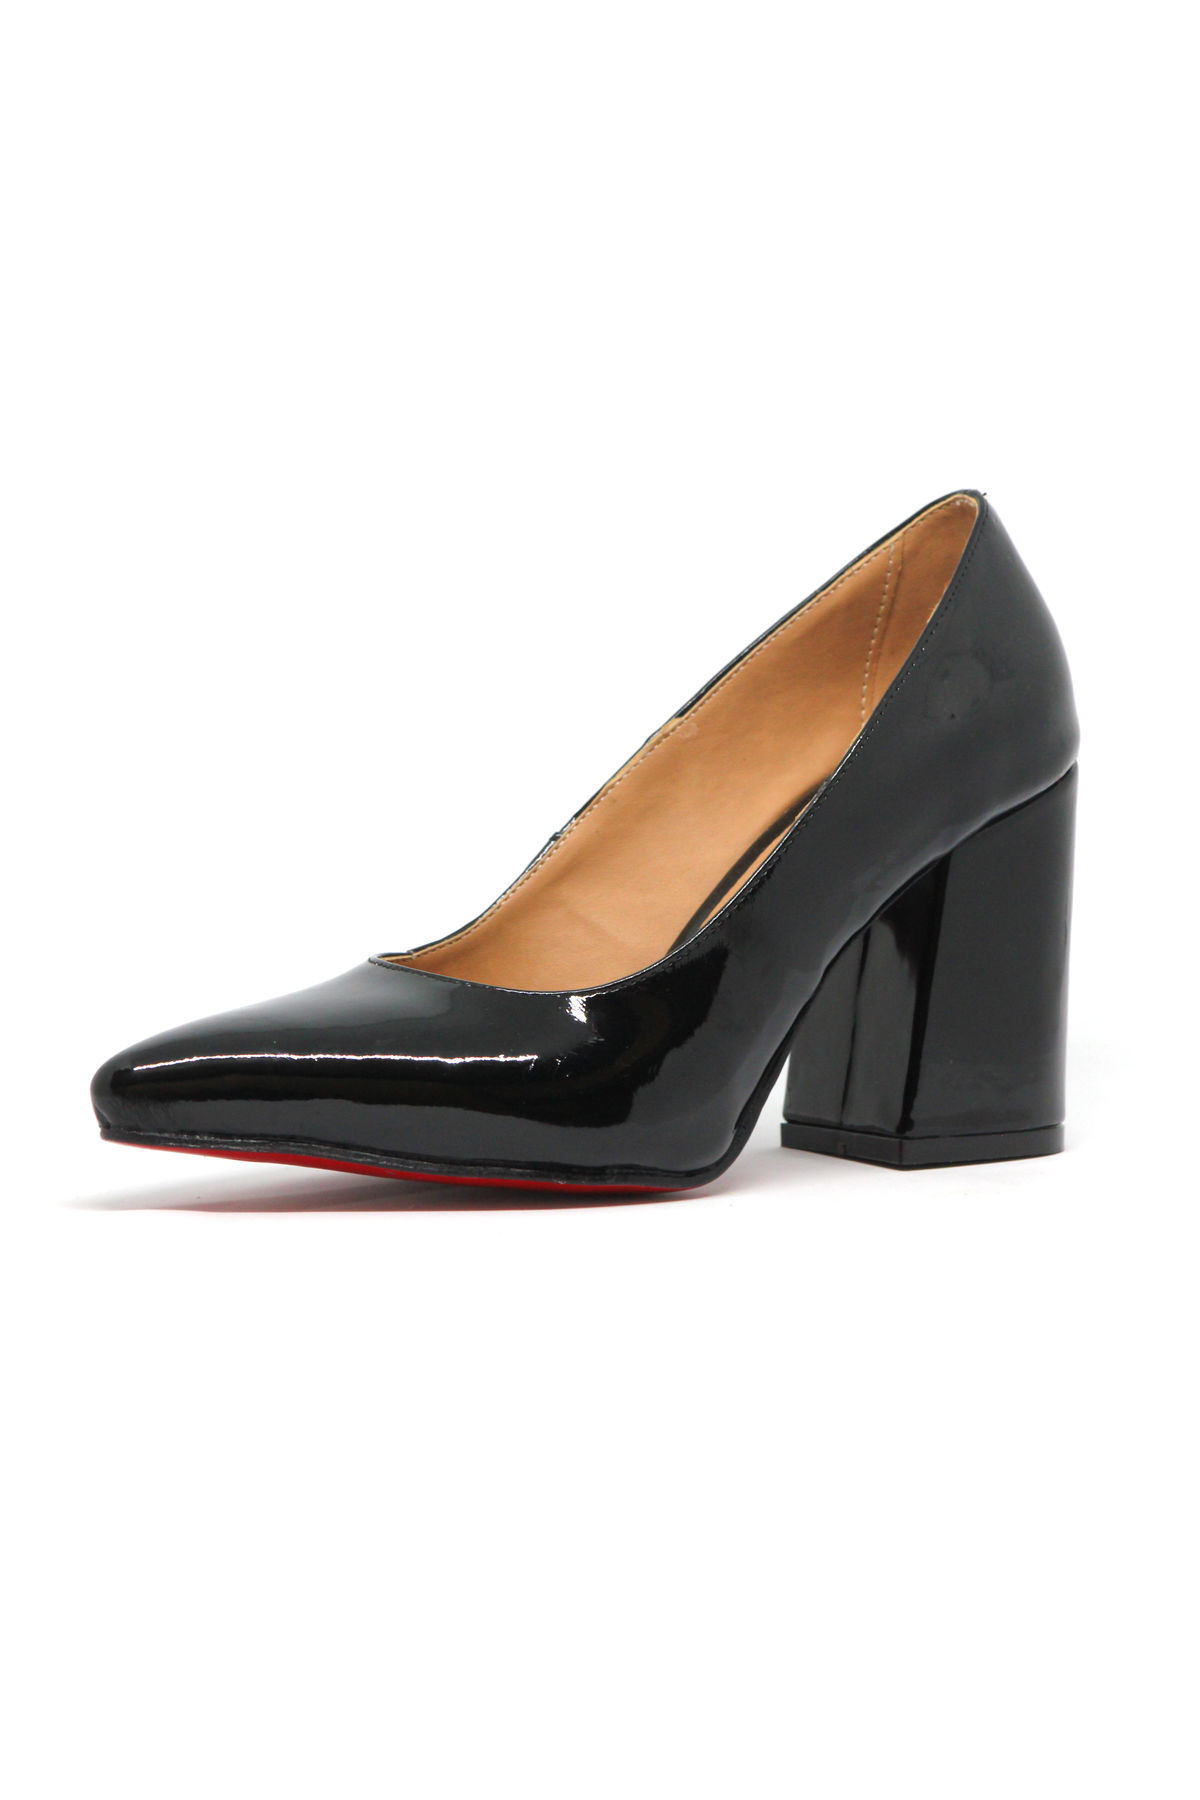 Imagen producto Zapato con taco ancho  5